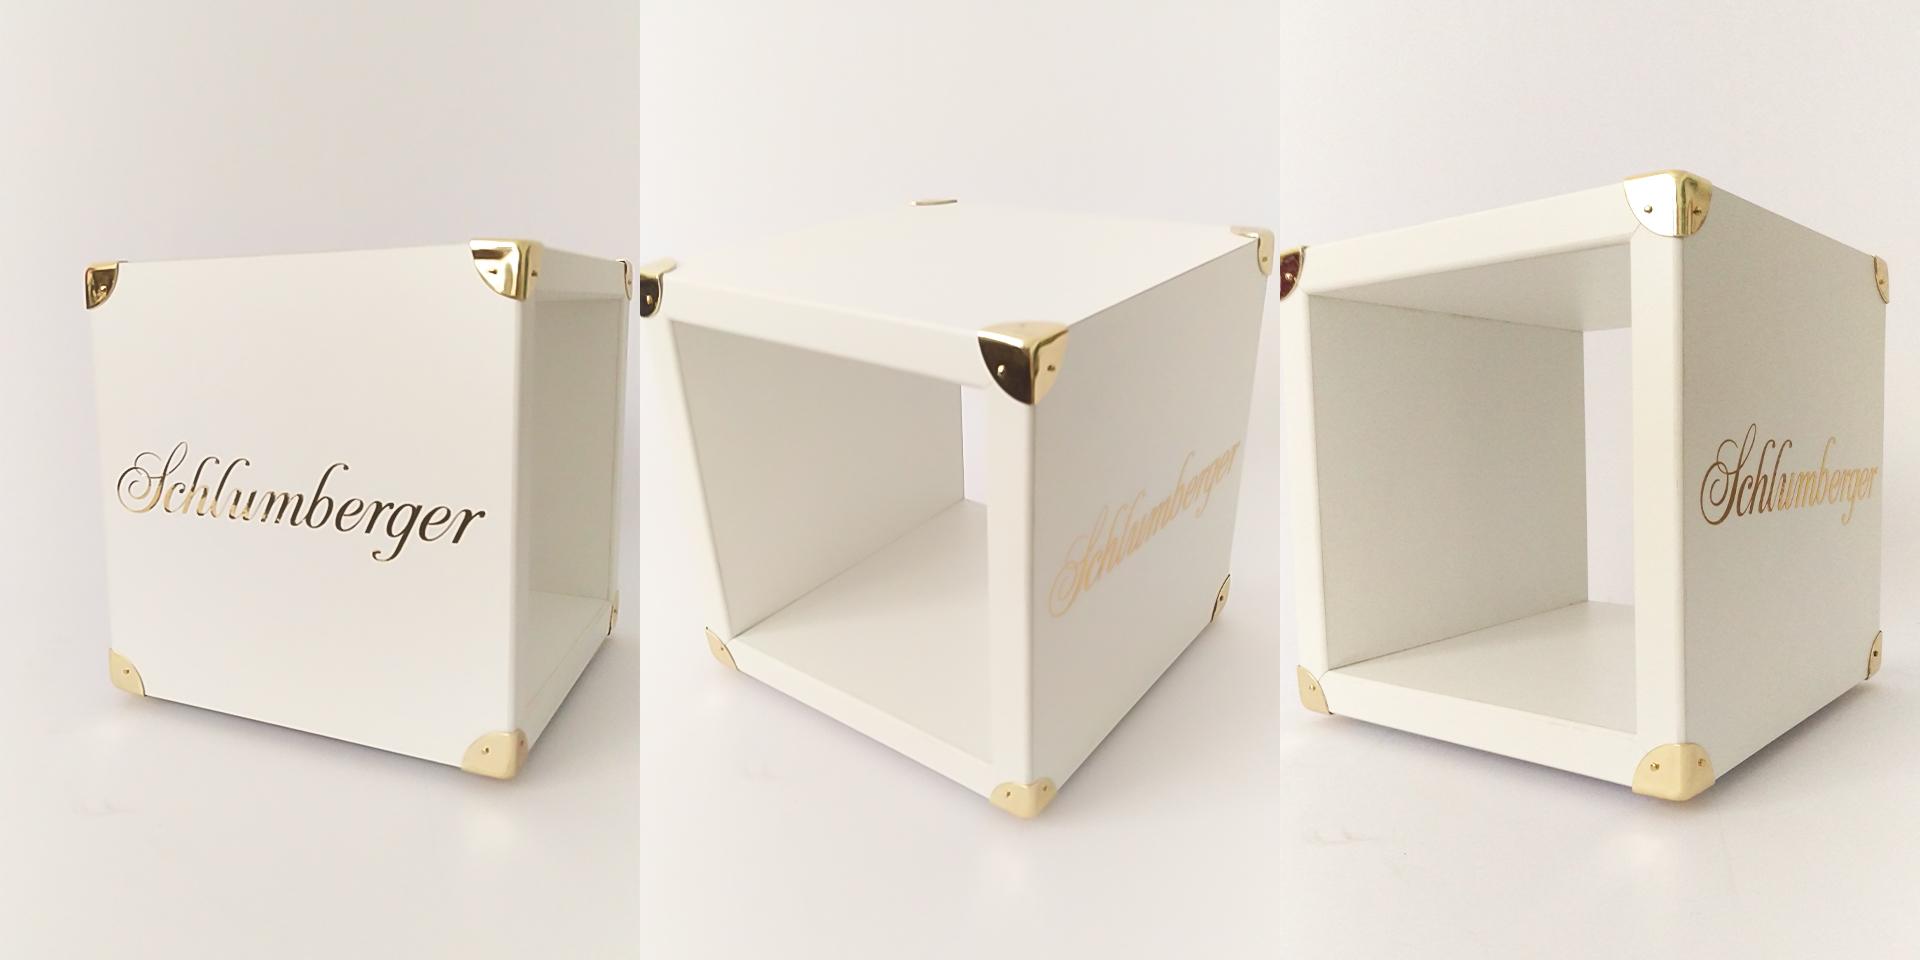 Schlumberger Mamont - Cube Display - Zweyloeven GmbH